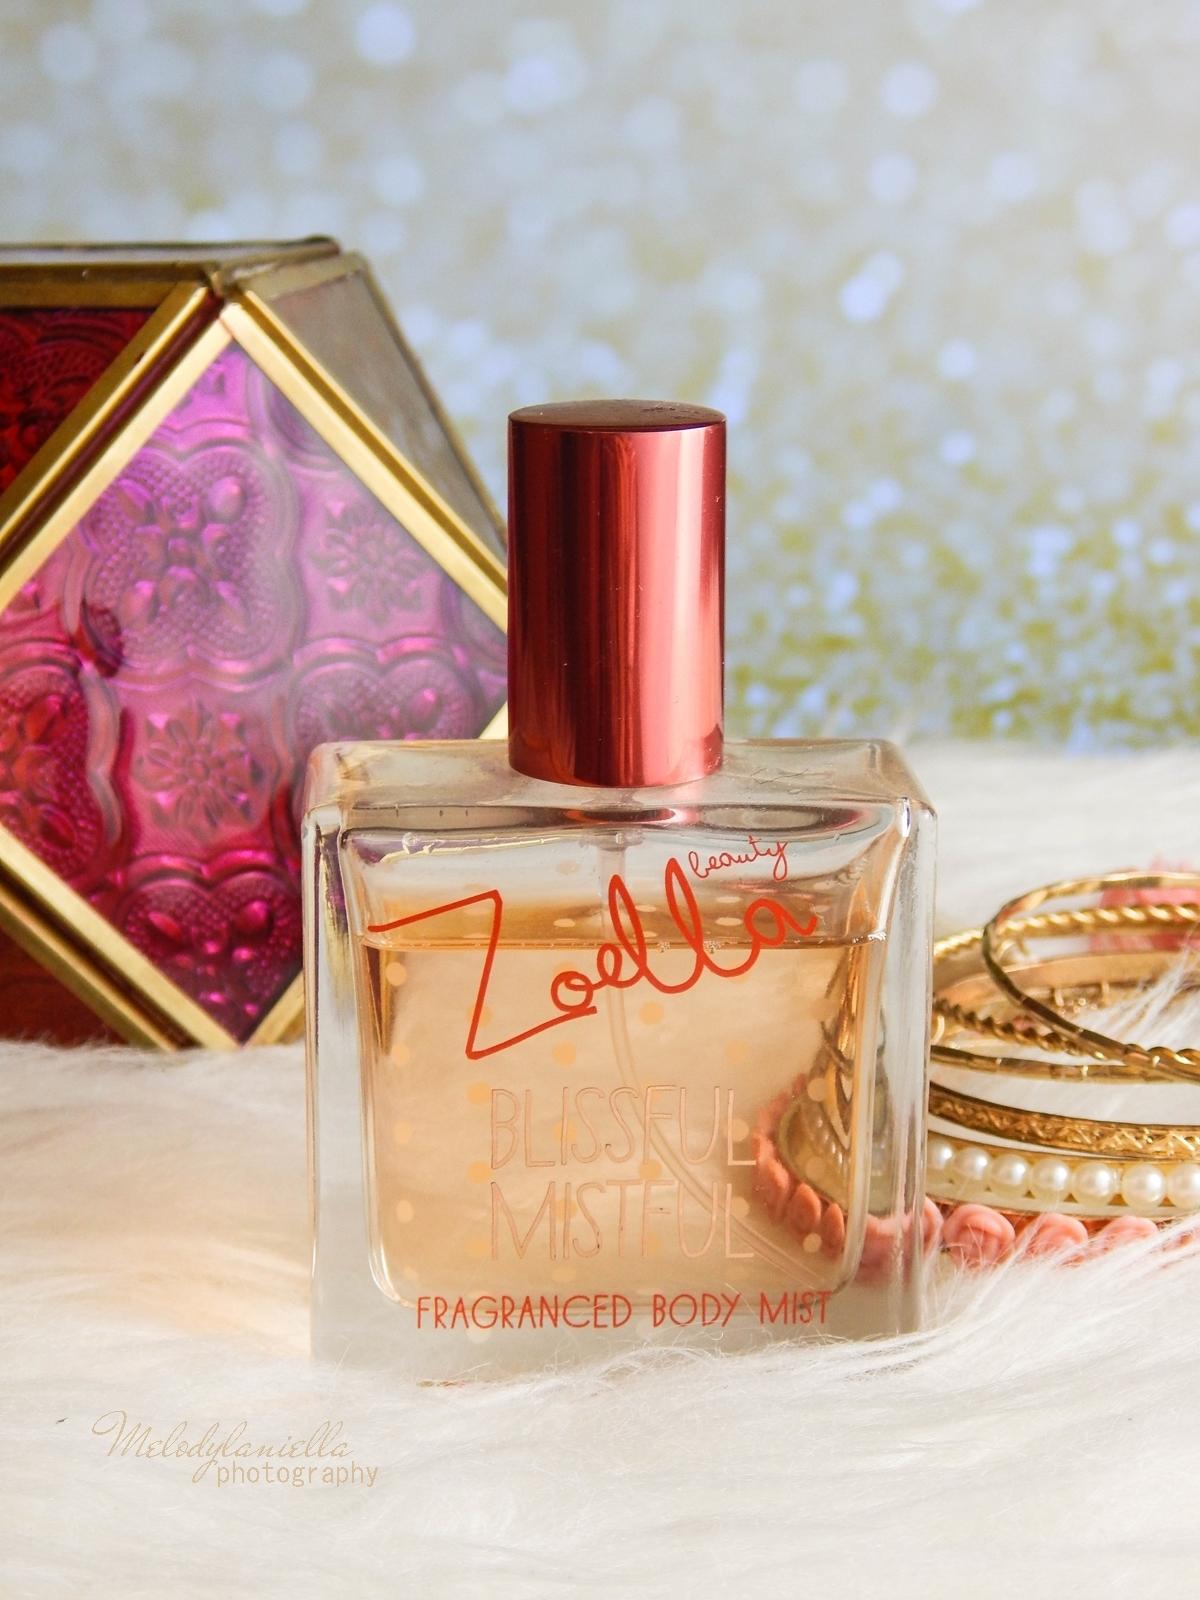 Zoella Blissful Mistful perfumy Zoella Beauty Superdrug recenzja kosmetyki Zoe Sugg moje ulubione perfumy na zimę melodylaniella style lifestyle blog